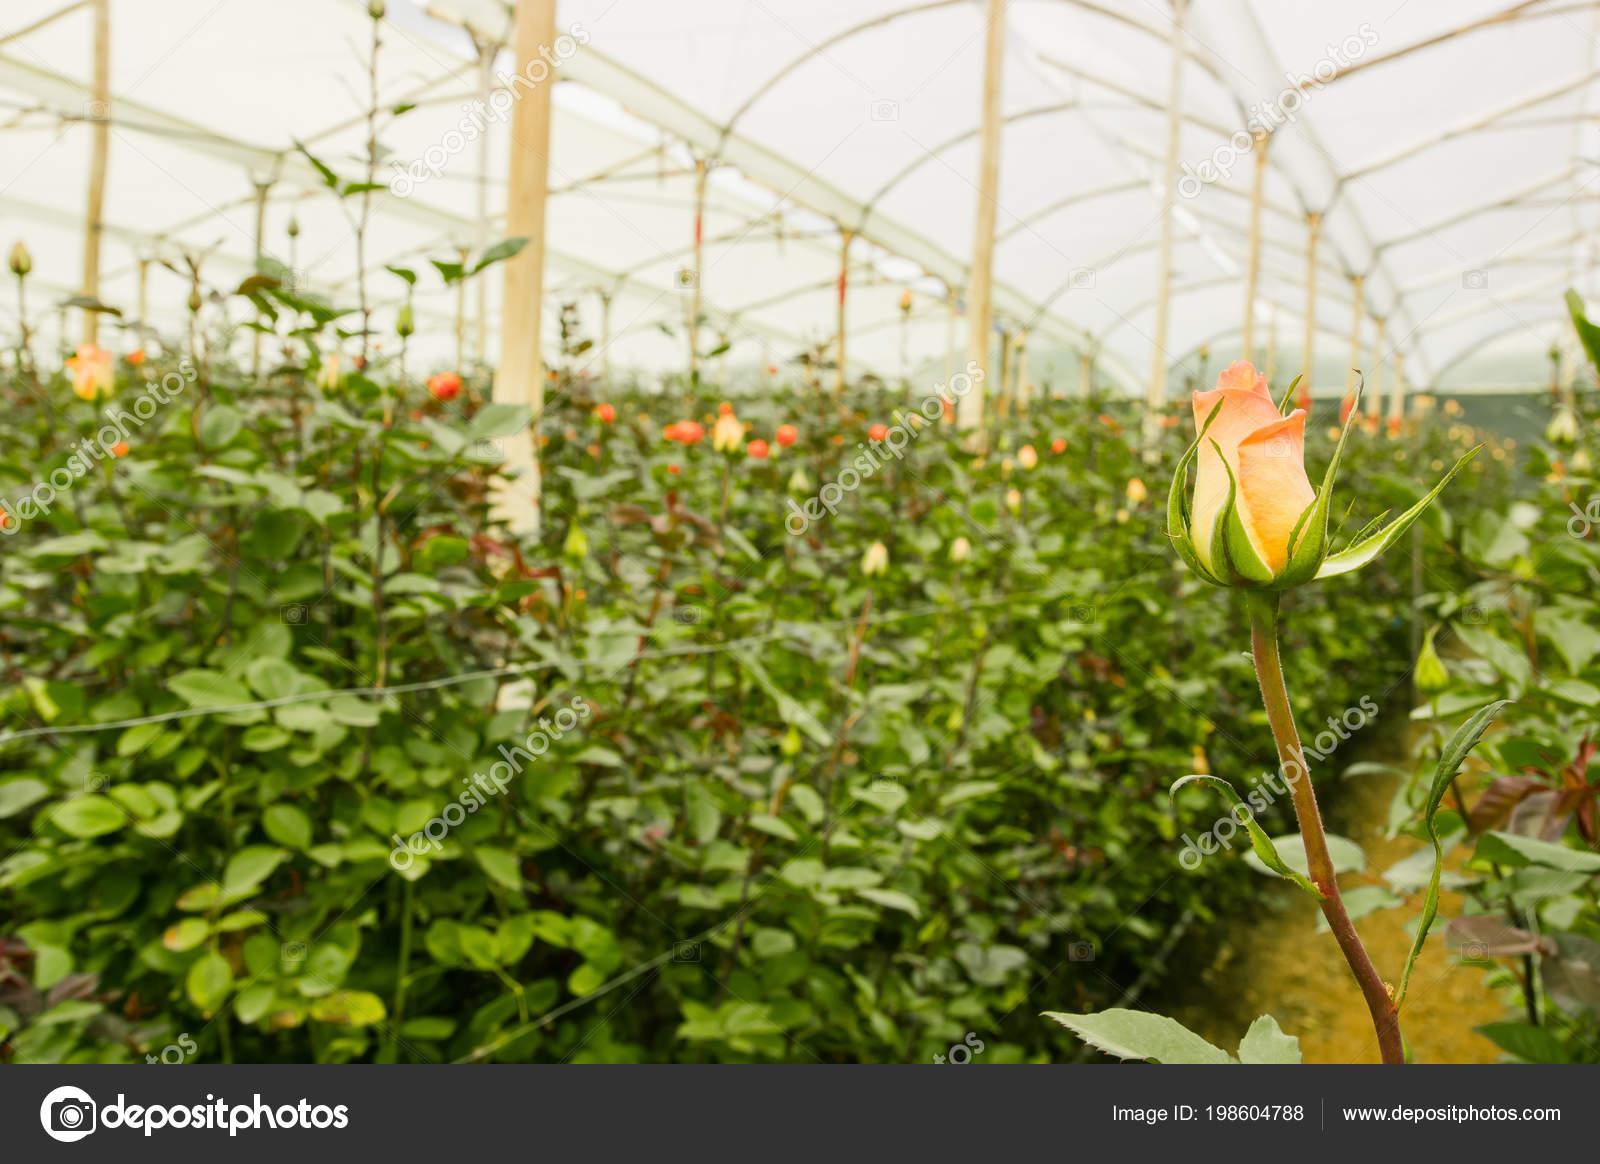 Beautiful single white rose flower in garden greenhouse in ecuador beautiful single white rose flower in garden greenhouse in ecuador stock photo izmirmasajfo